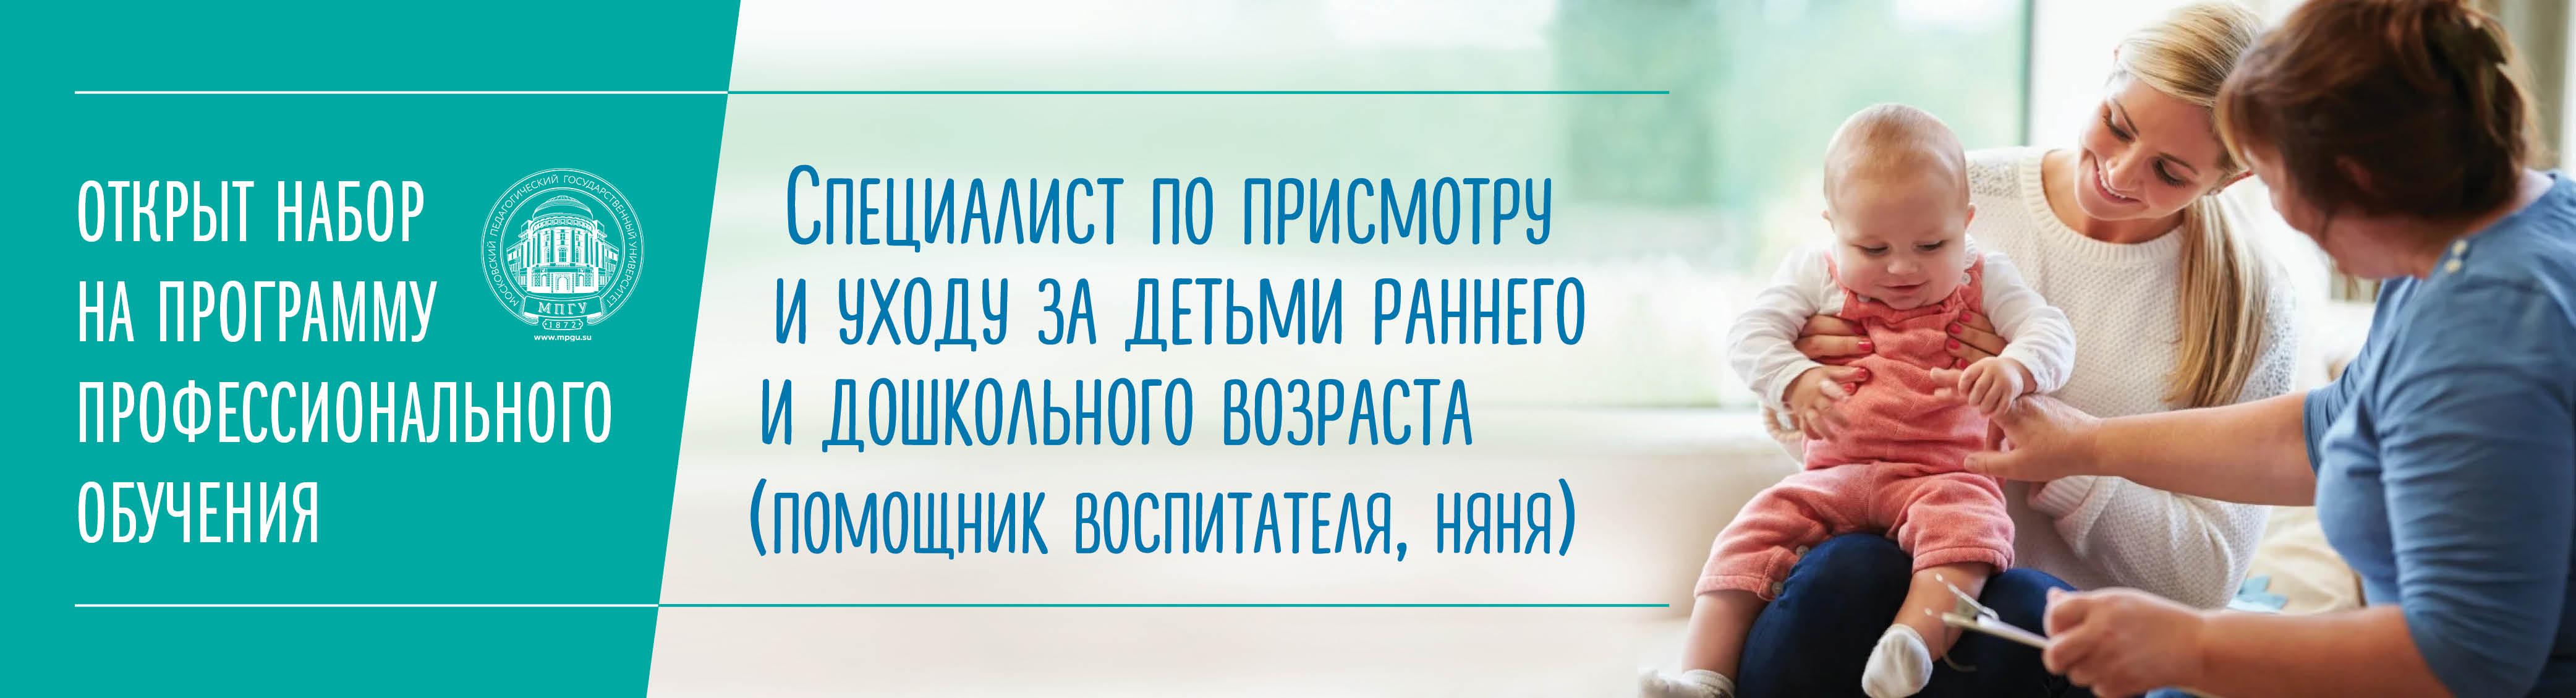 Prof_Obuch_NYANYA3